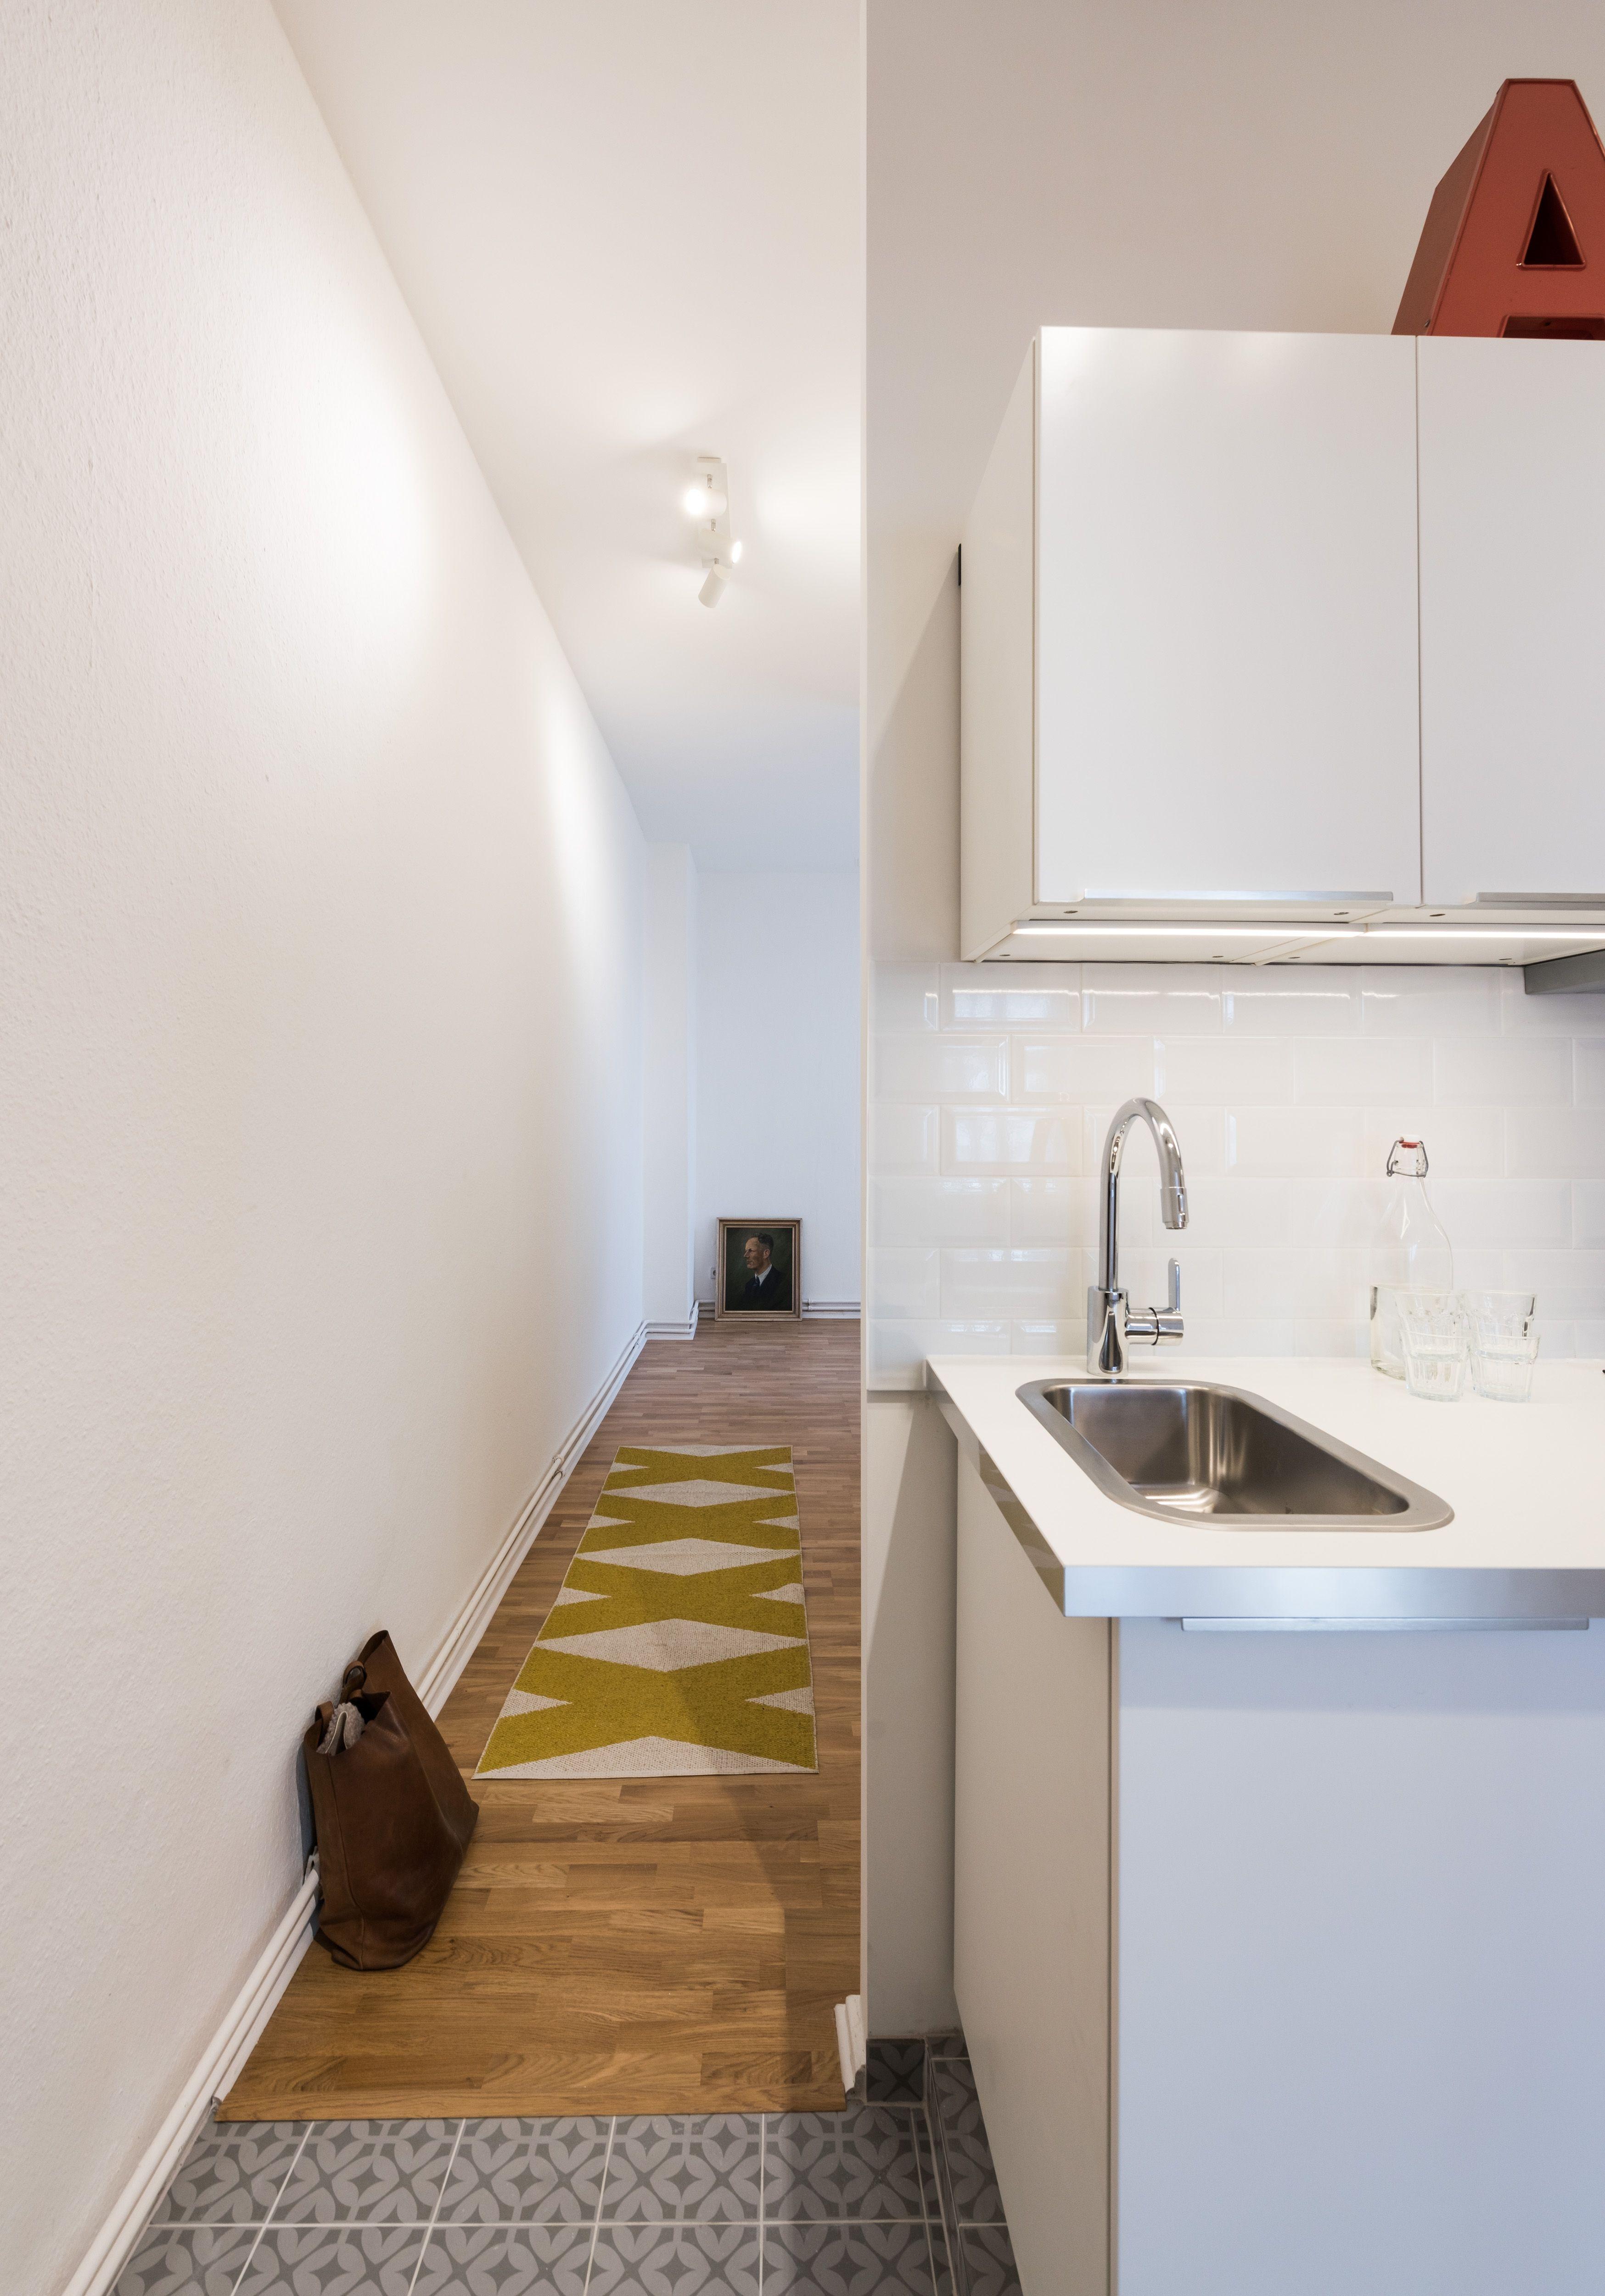 Wohnungsumbau Berlin By Flnkarchitekten